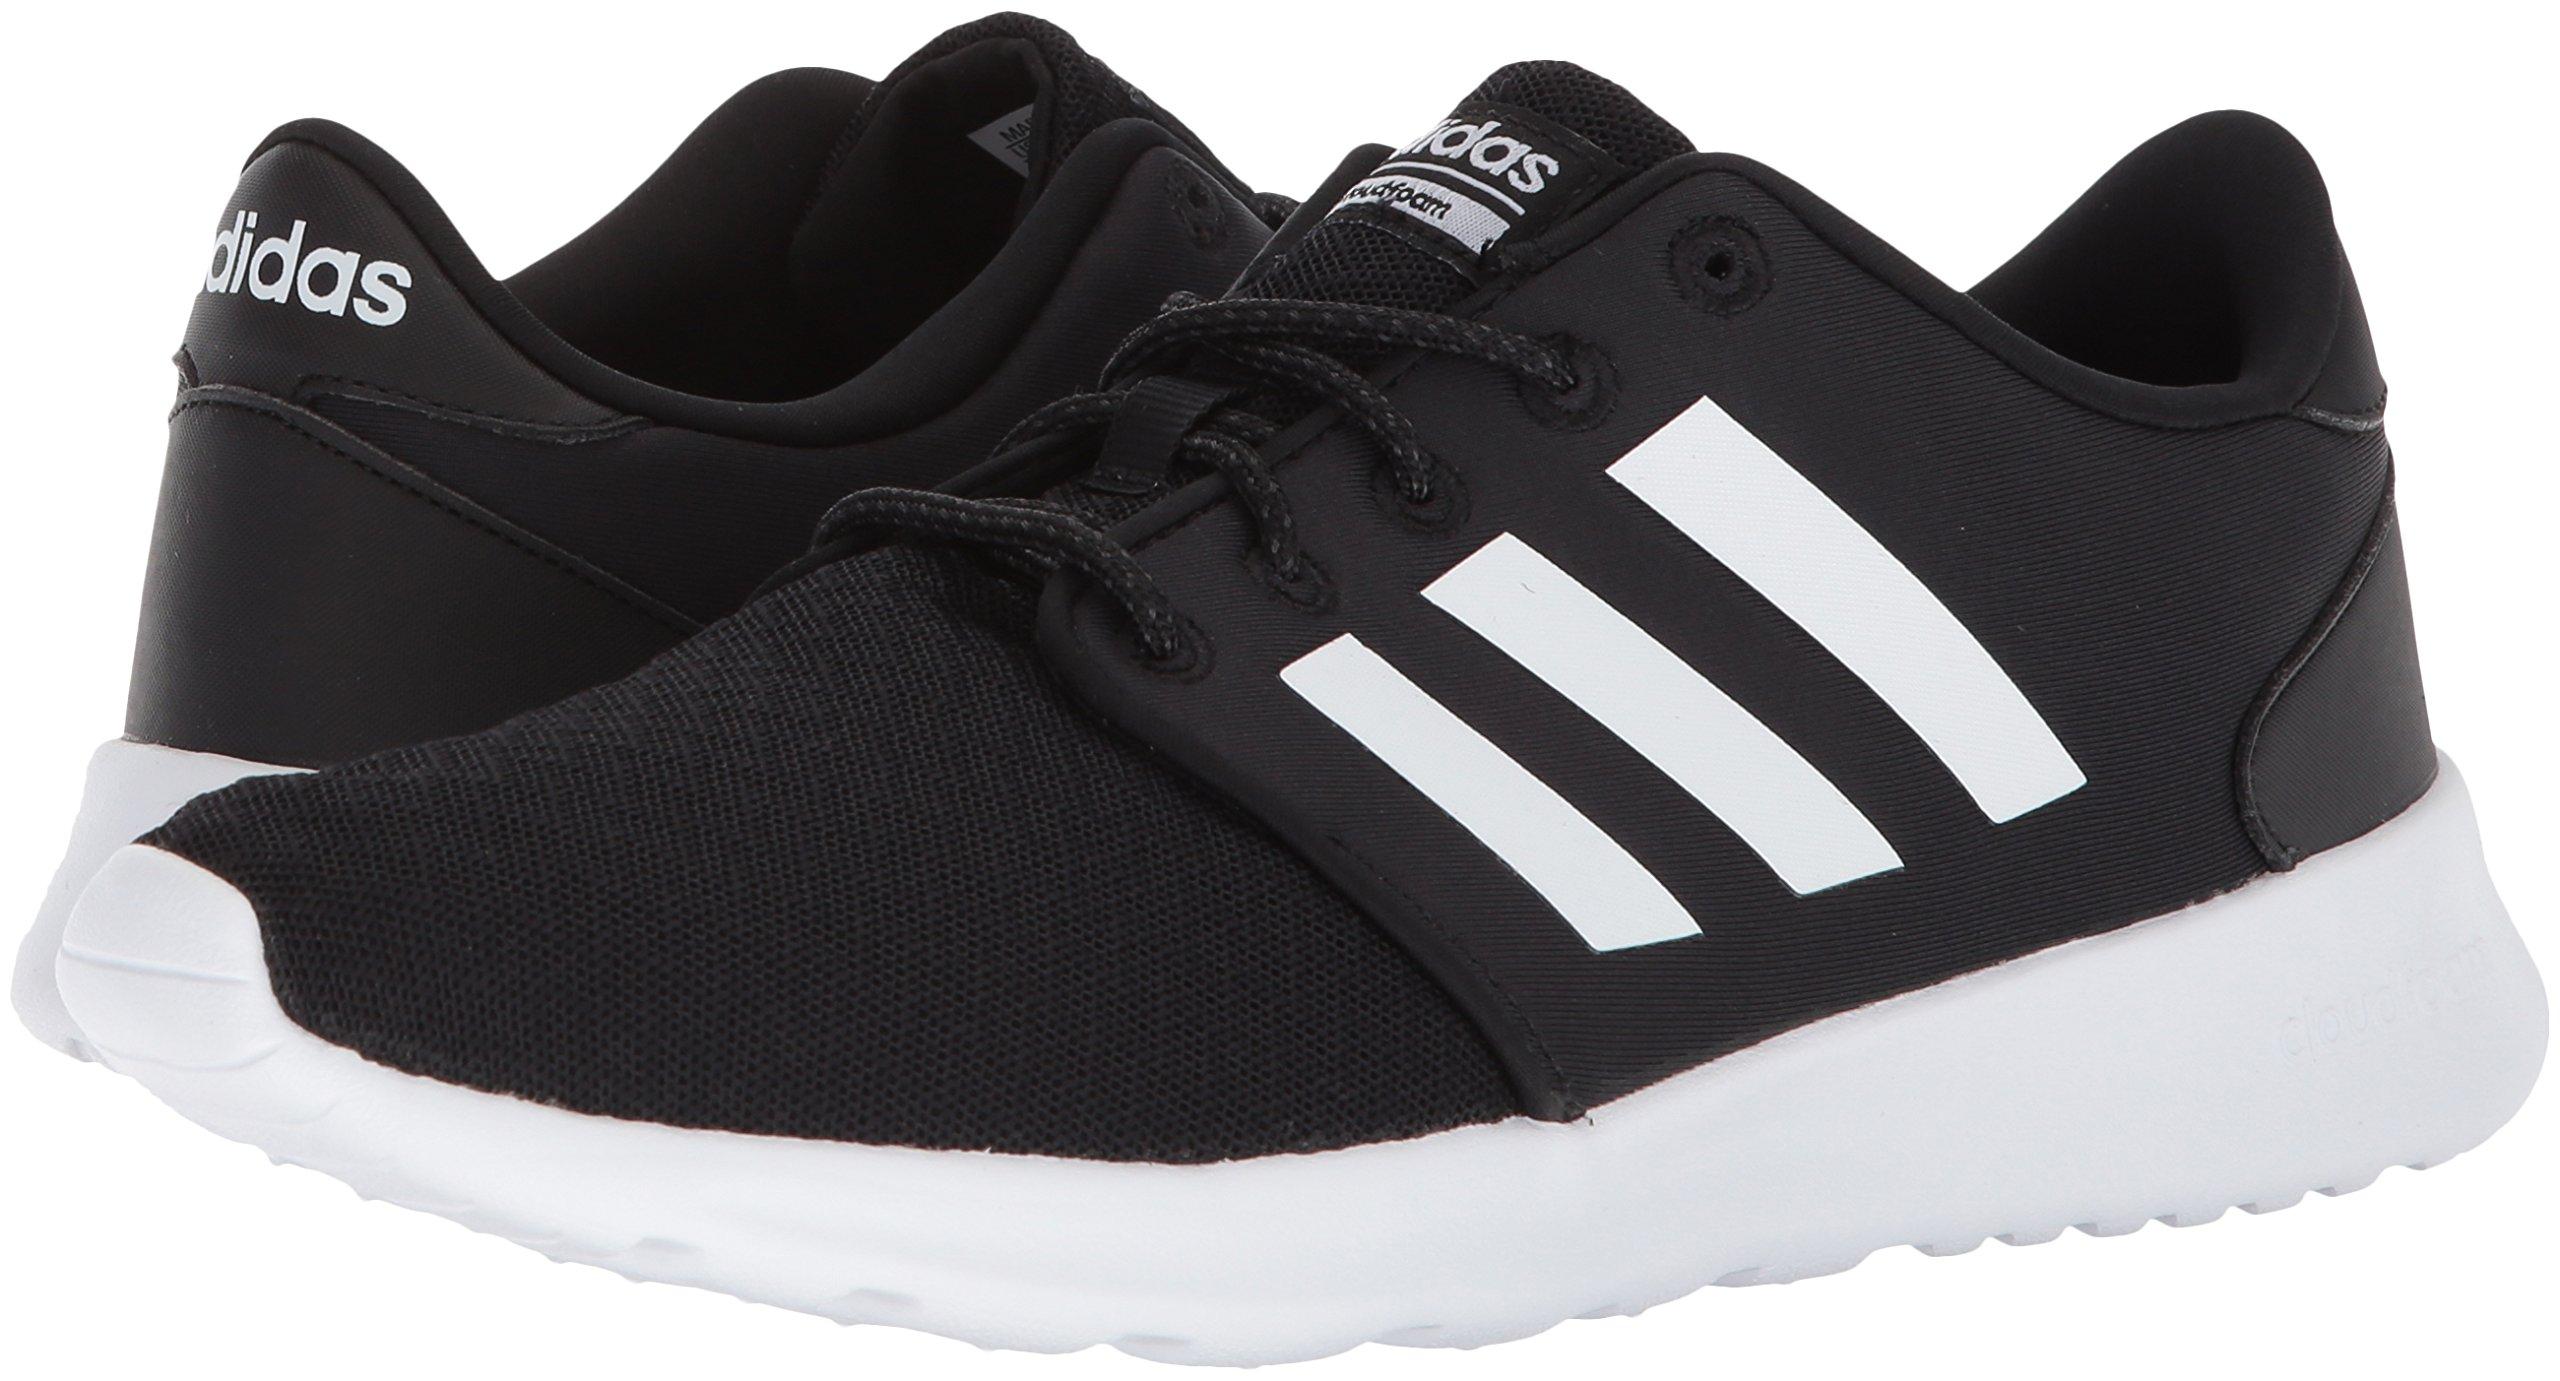 adidas Women's Cloudfoam QT Racer Running Shoe, Black/White/Carbon, 5 M US by adidas (Image #6)